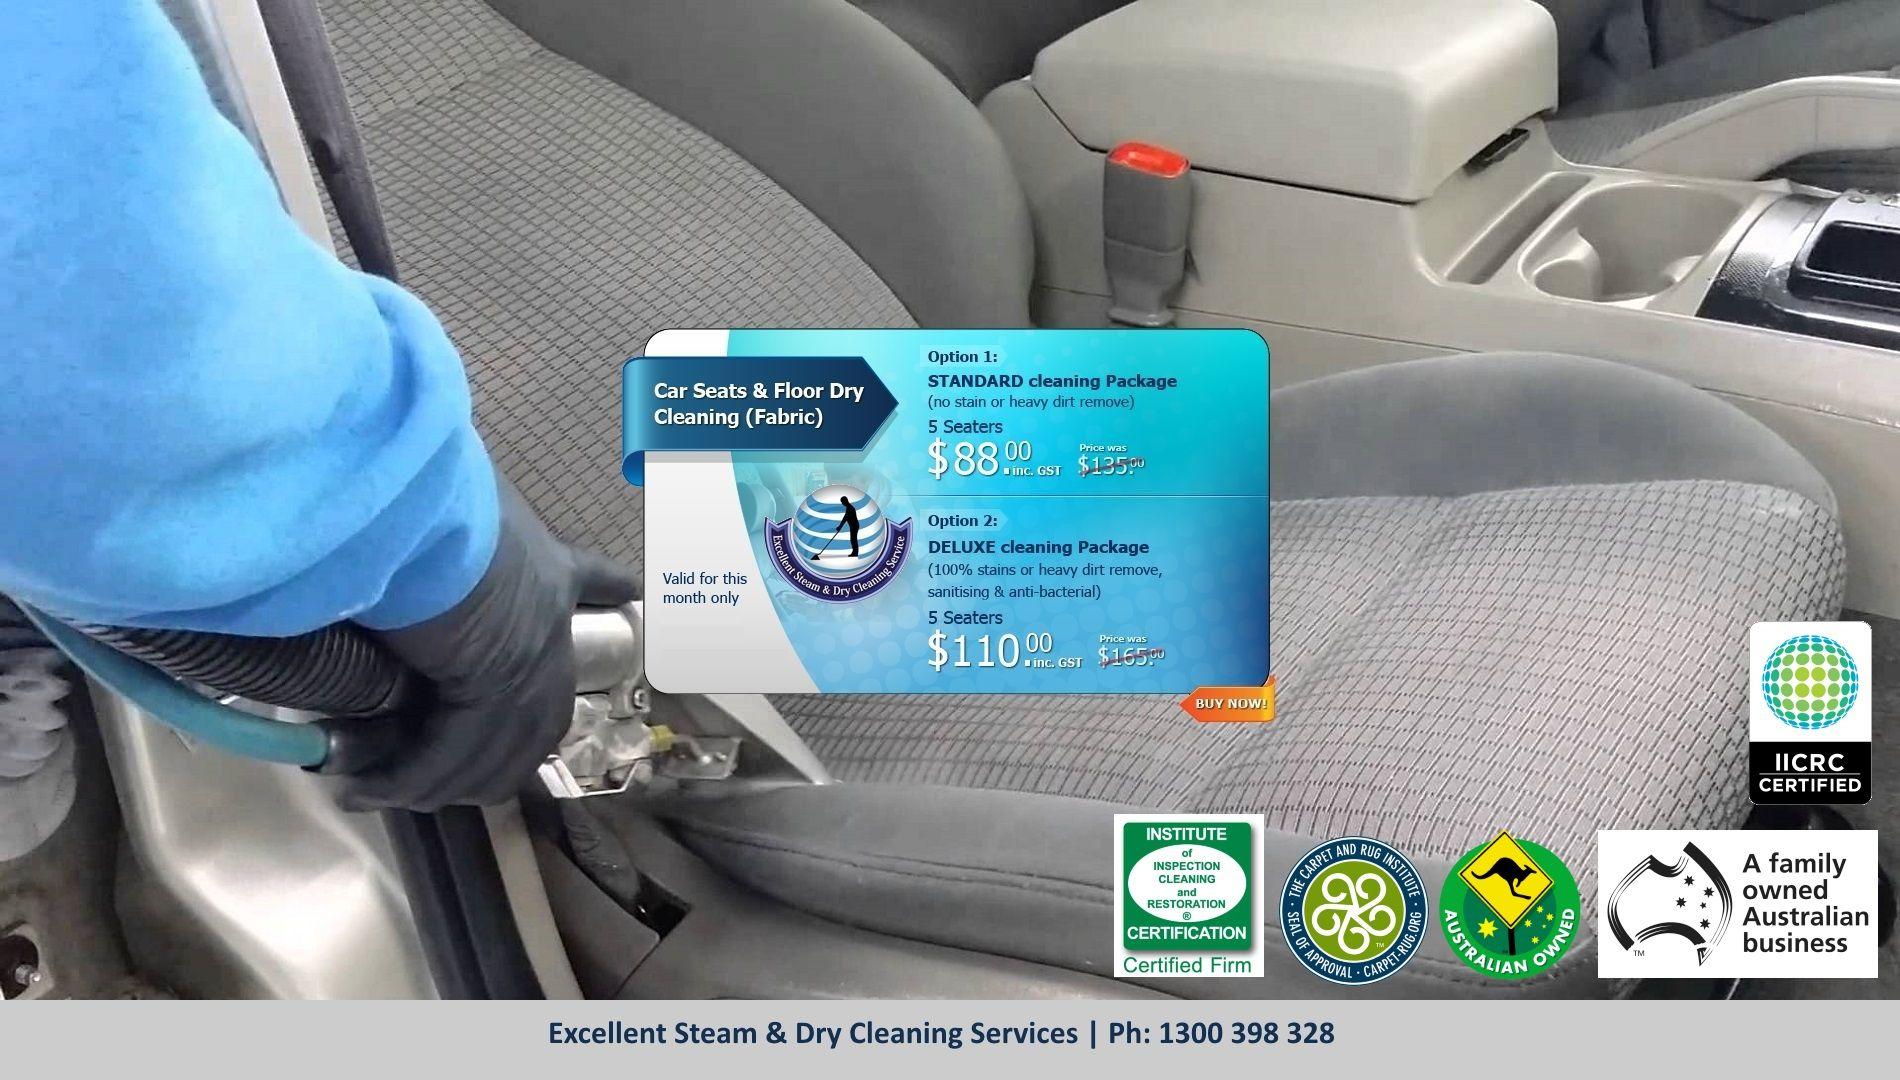 https://www.excellentcleaning.com.au/ImageOptimized/NewImage/car-seat-steam-cleaning2-compressor.jpg